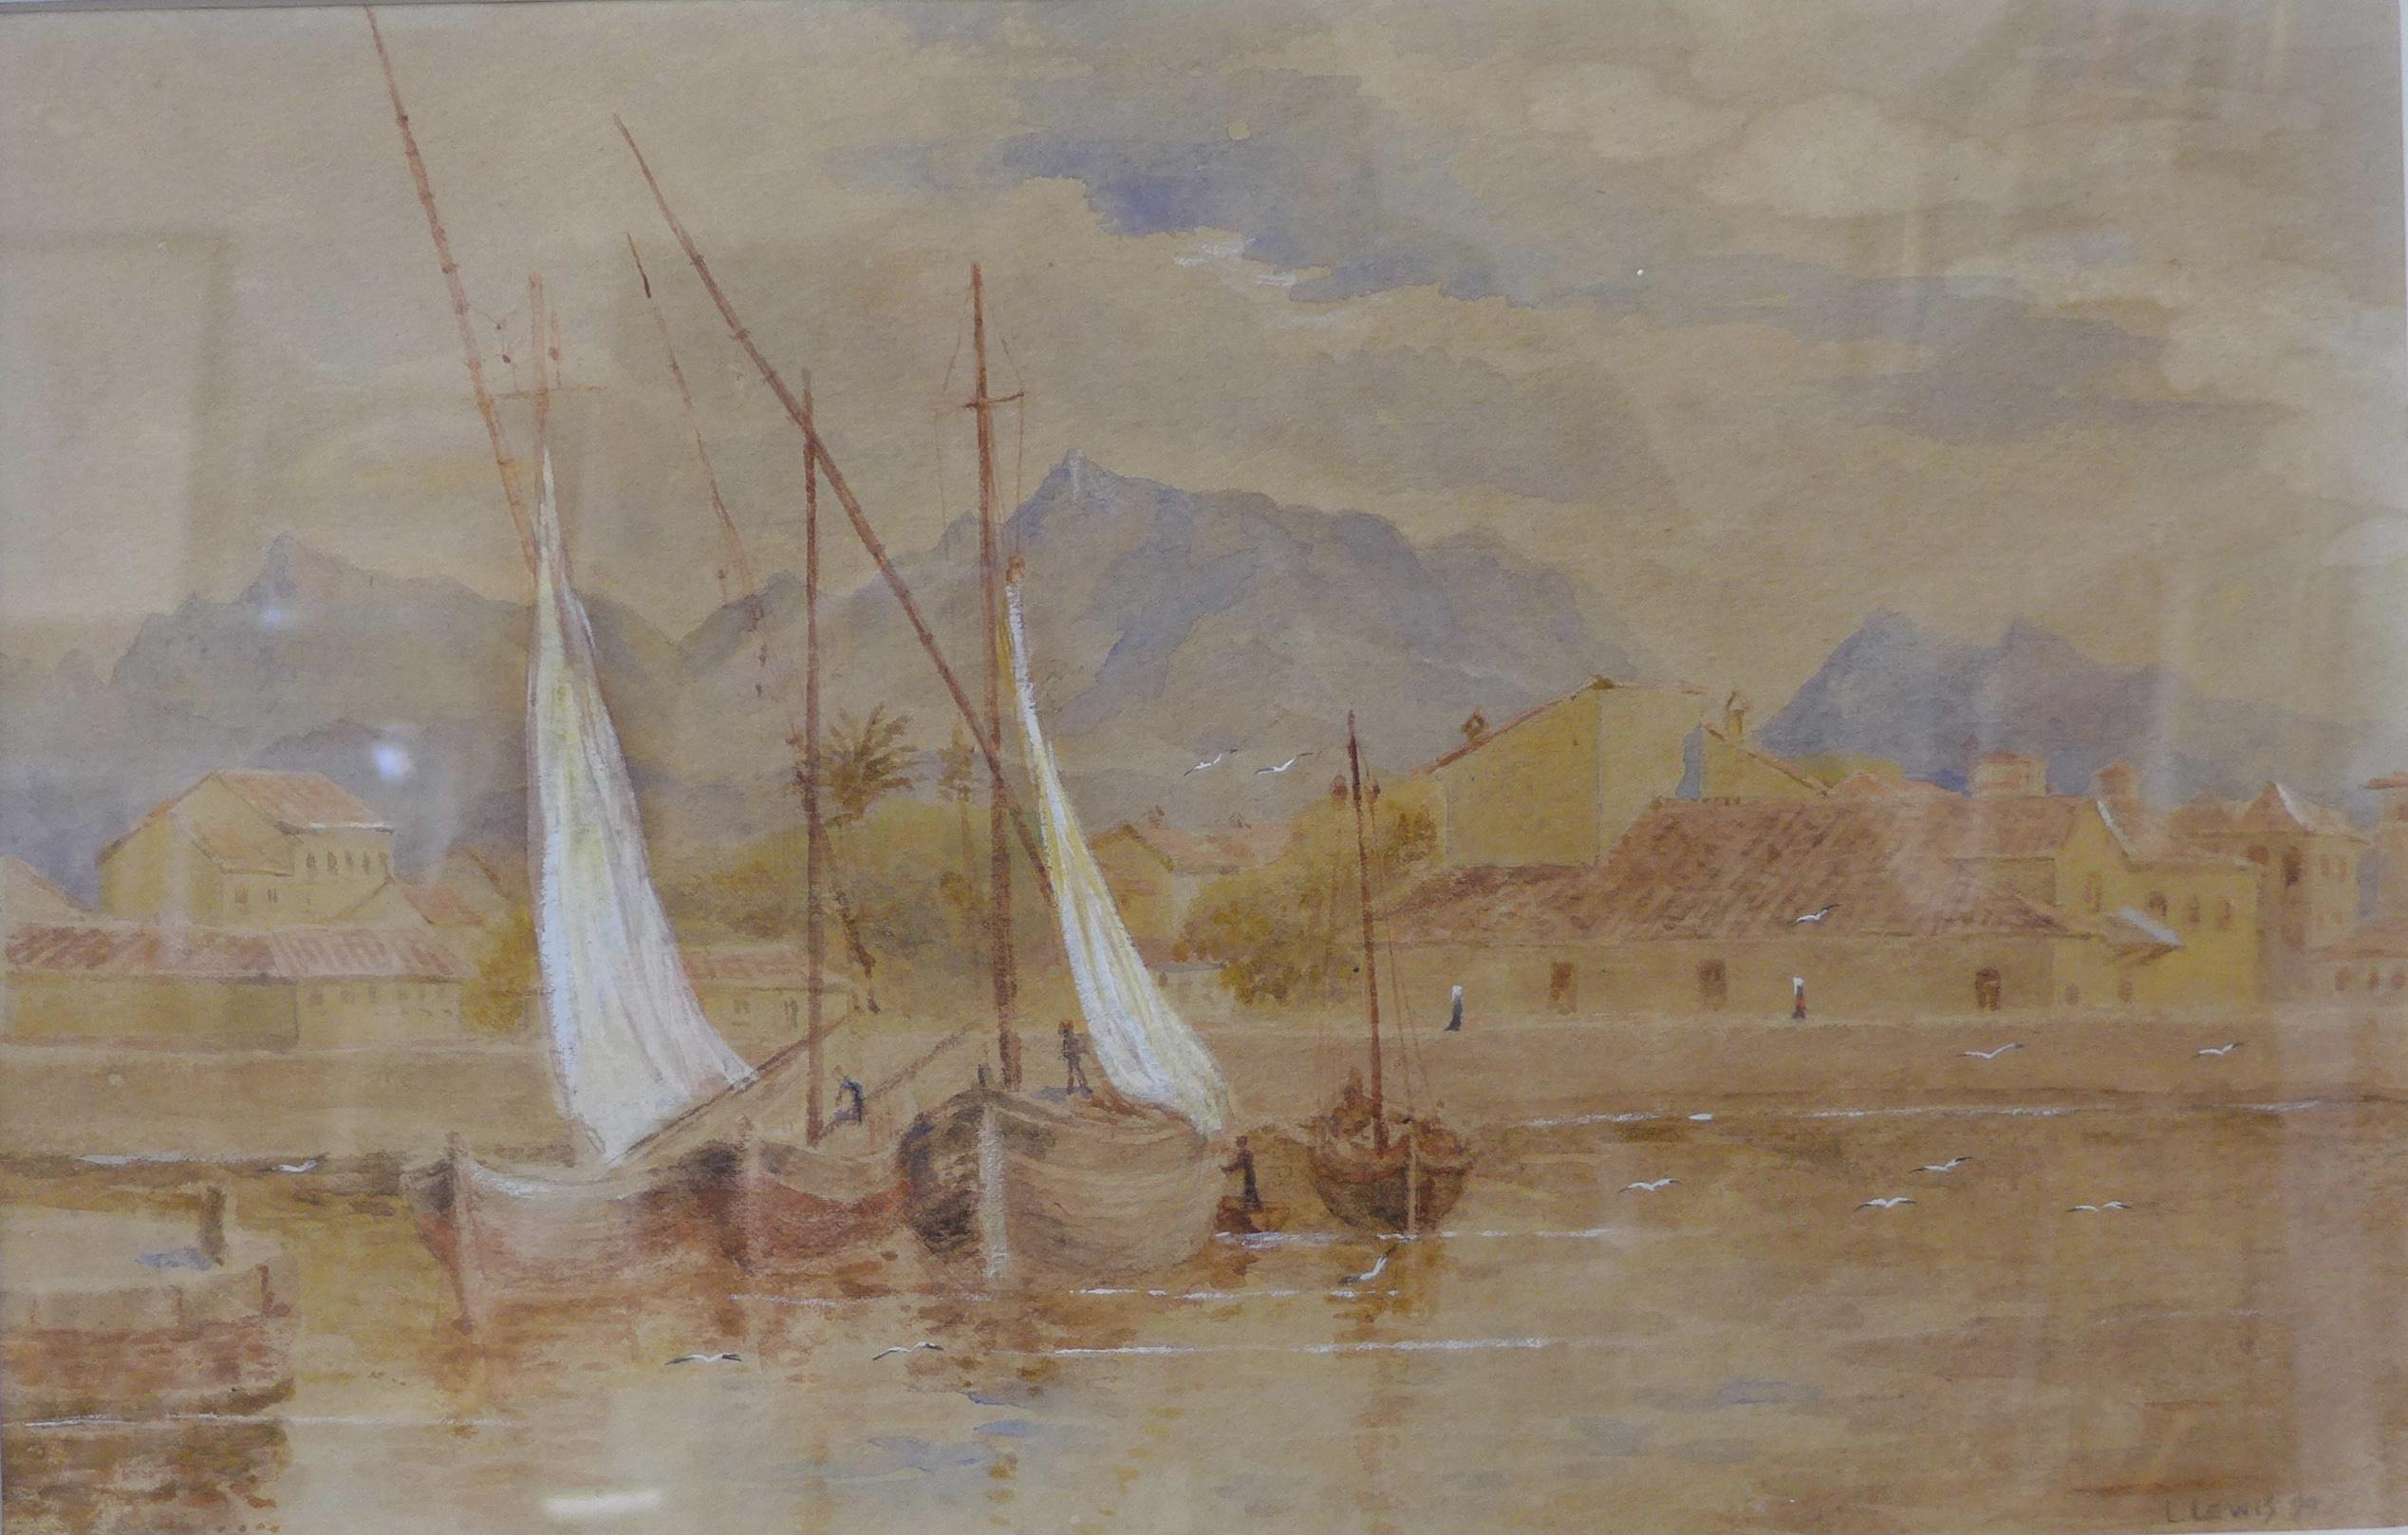 Lot 34 - Leonard Lewis, Viareggio, Near Pisa, watercolour, dated 1899, 20 x 32cms,